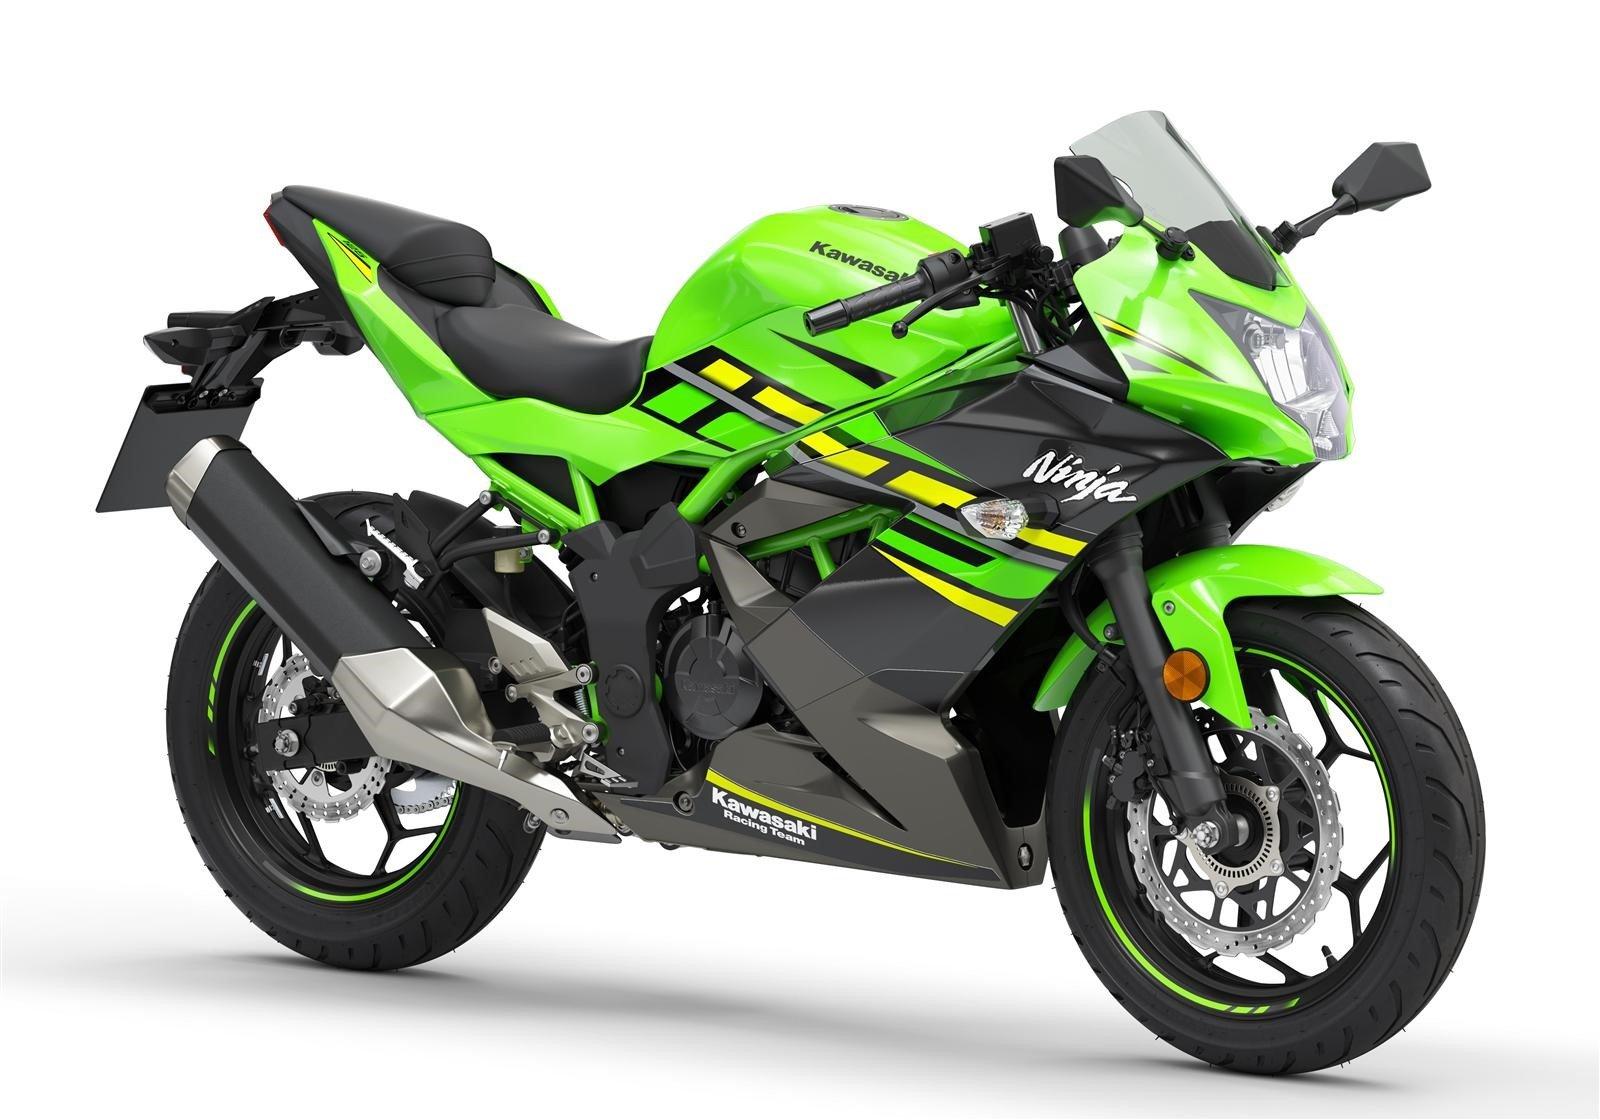 New 2019 Kawasaki Ninja 125 ABS KRT**SAVE £800!!** For Sale (picture 1 of 6)